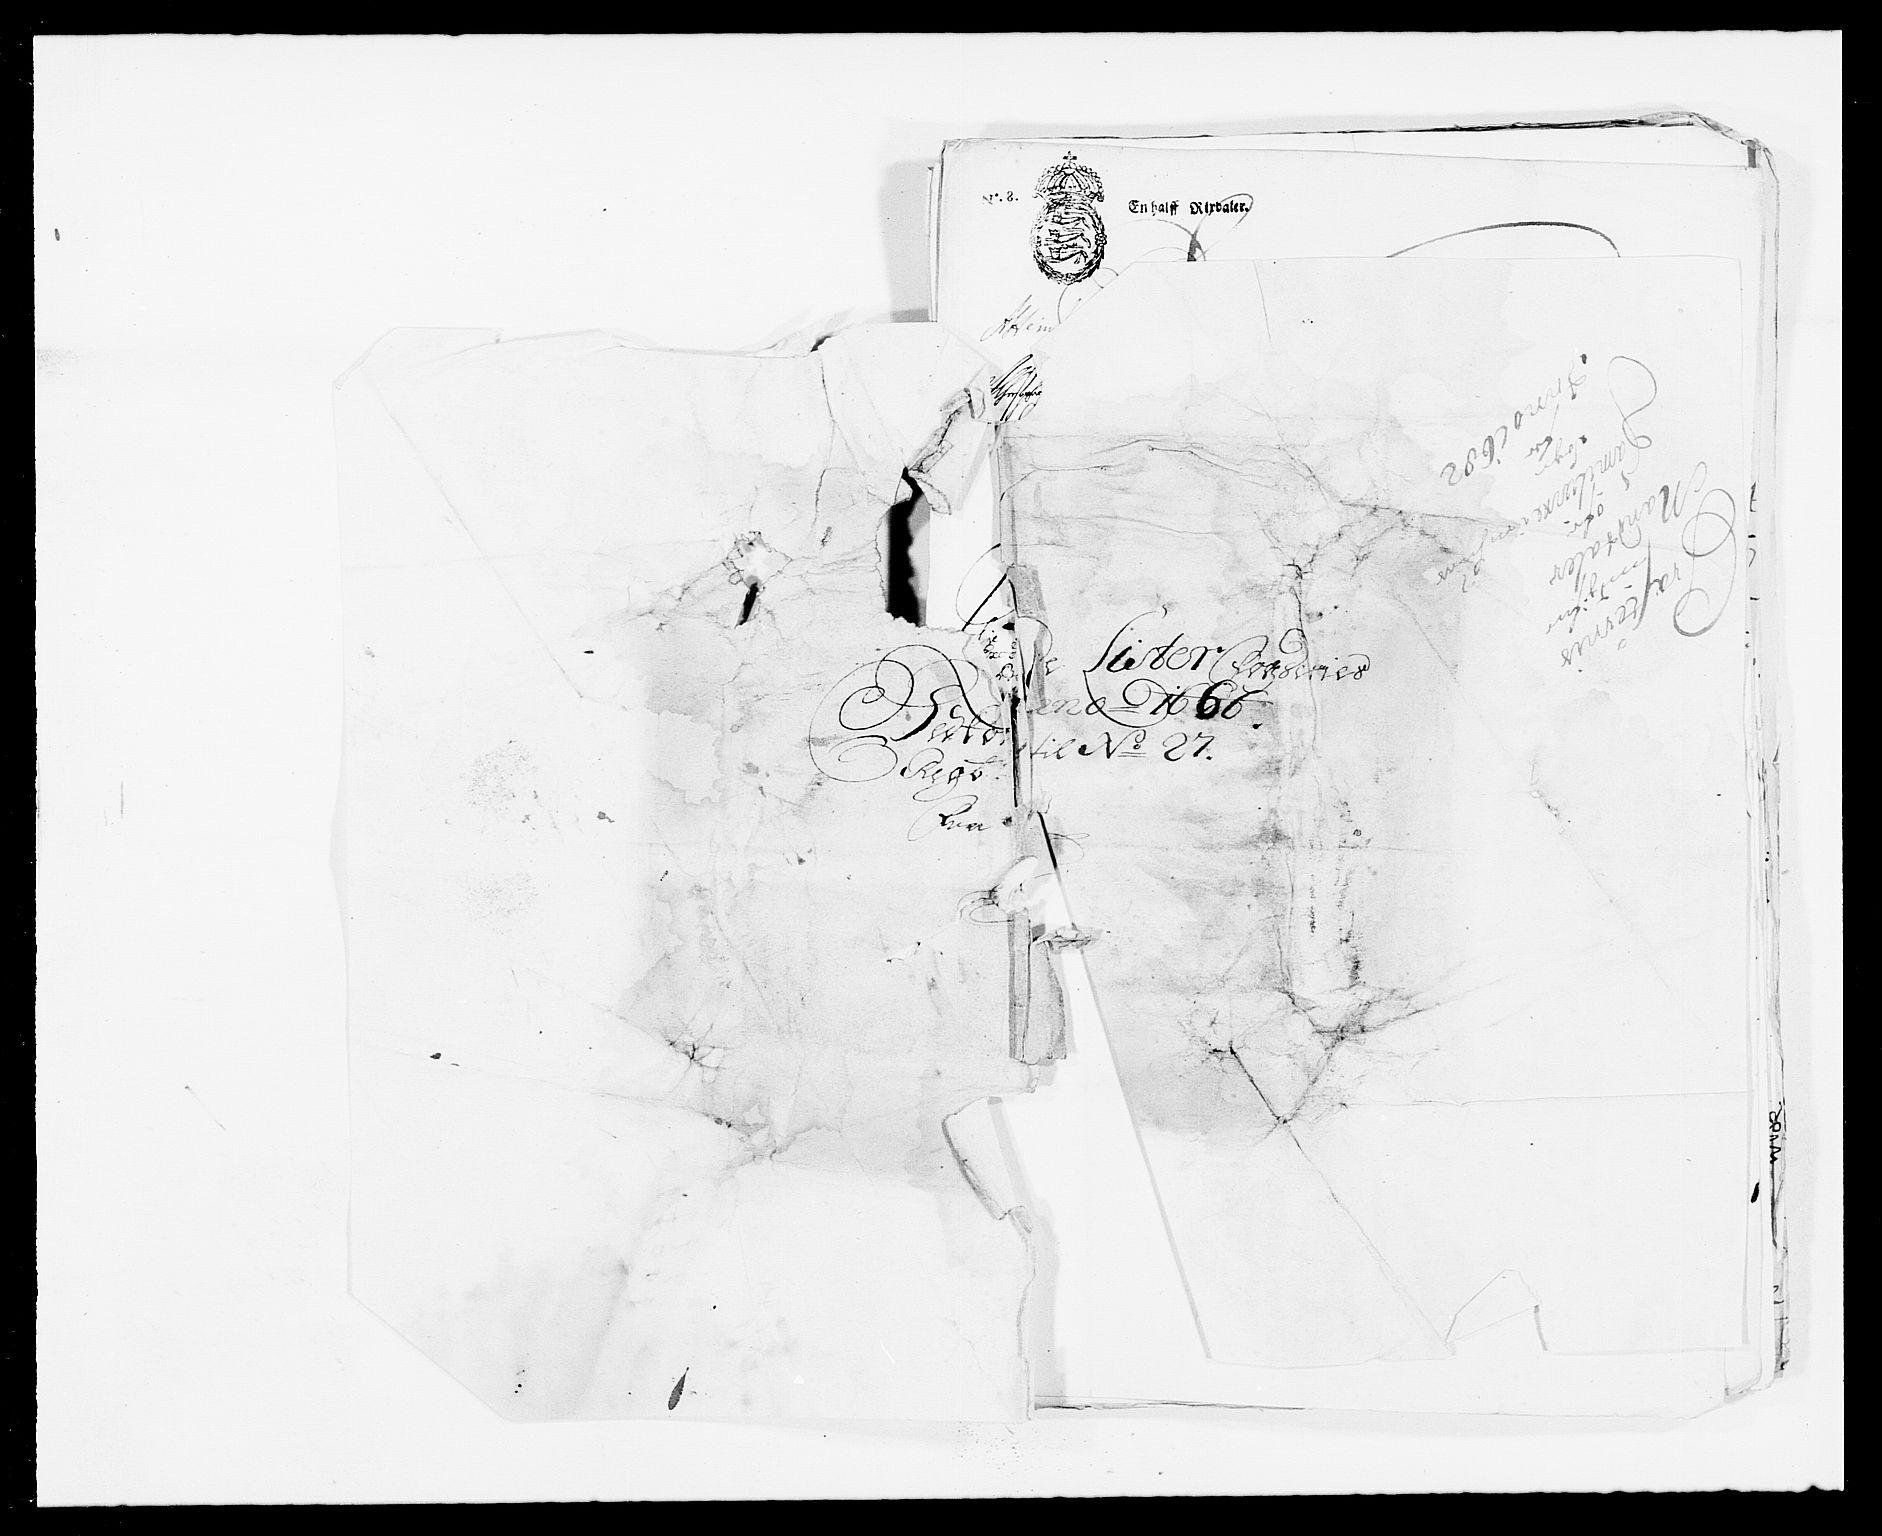 RA, Rentekammeret inntil 1814, Reviderte regnskaper, Fogderegnskap, R41/L2524: Fogderegnskap Lista, 1665-1668, s. 226